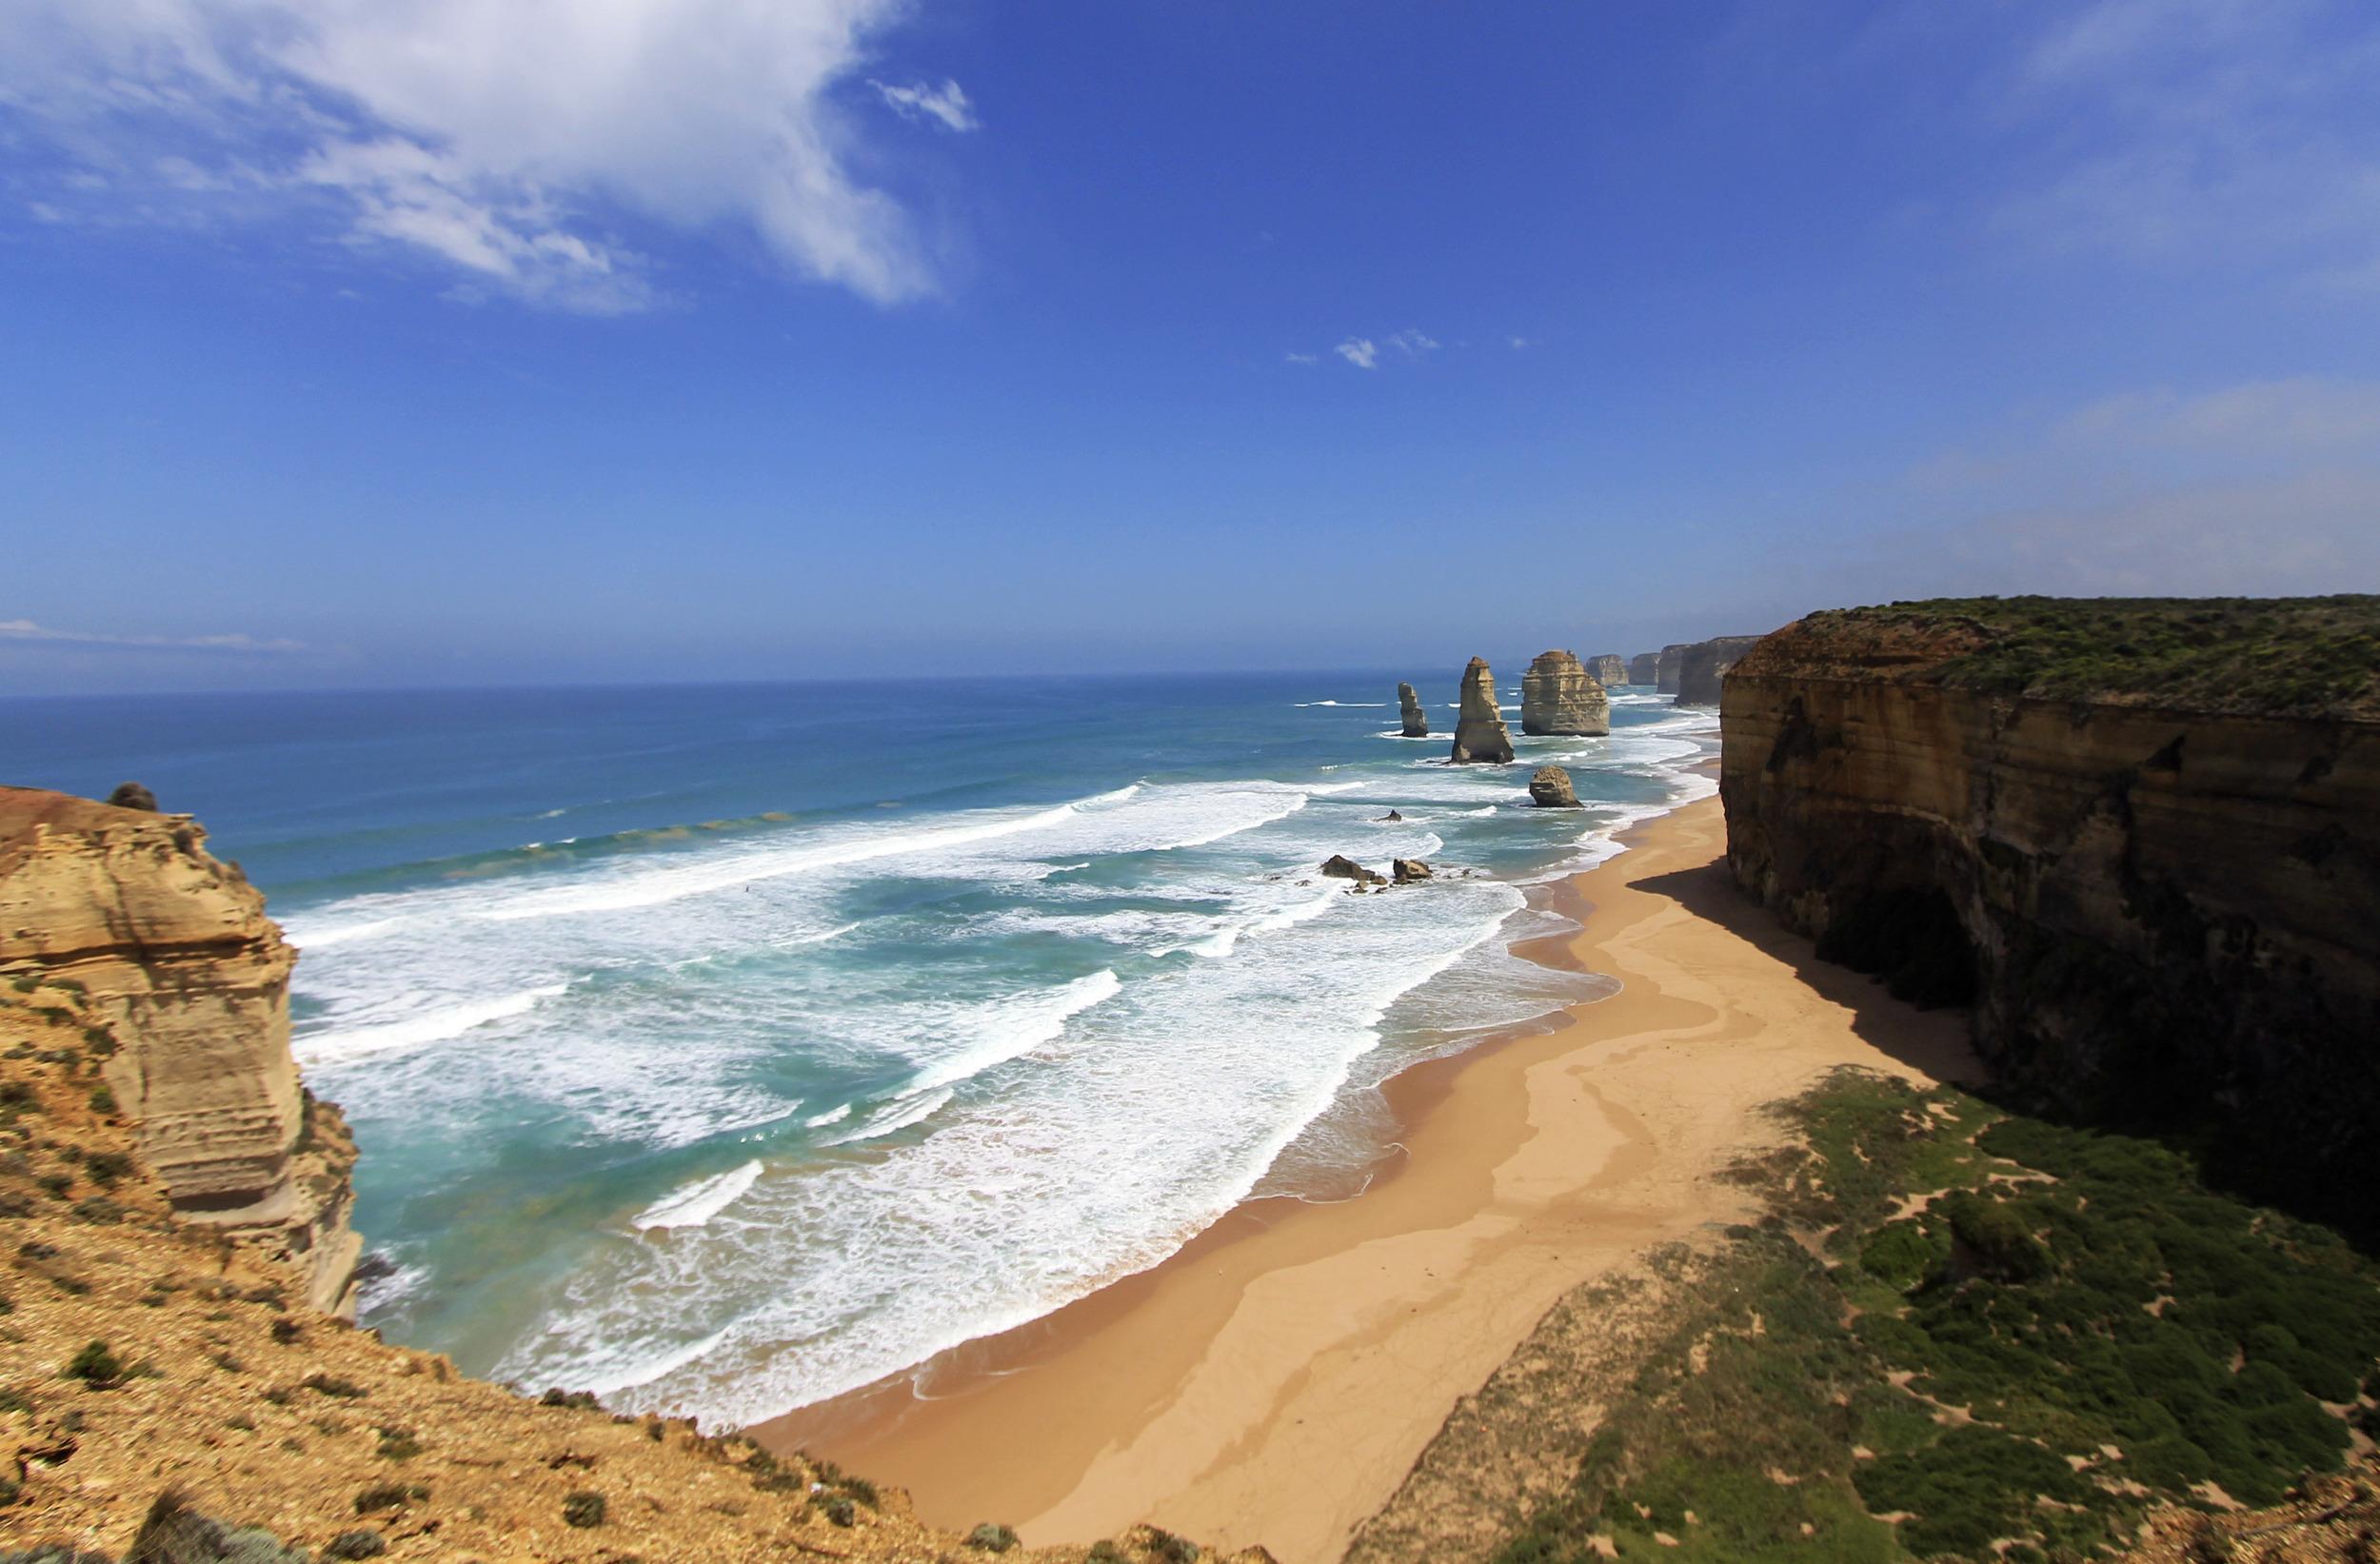 12-apostles-victoria-australia-great-ocean-road.jpg